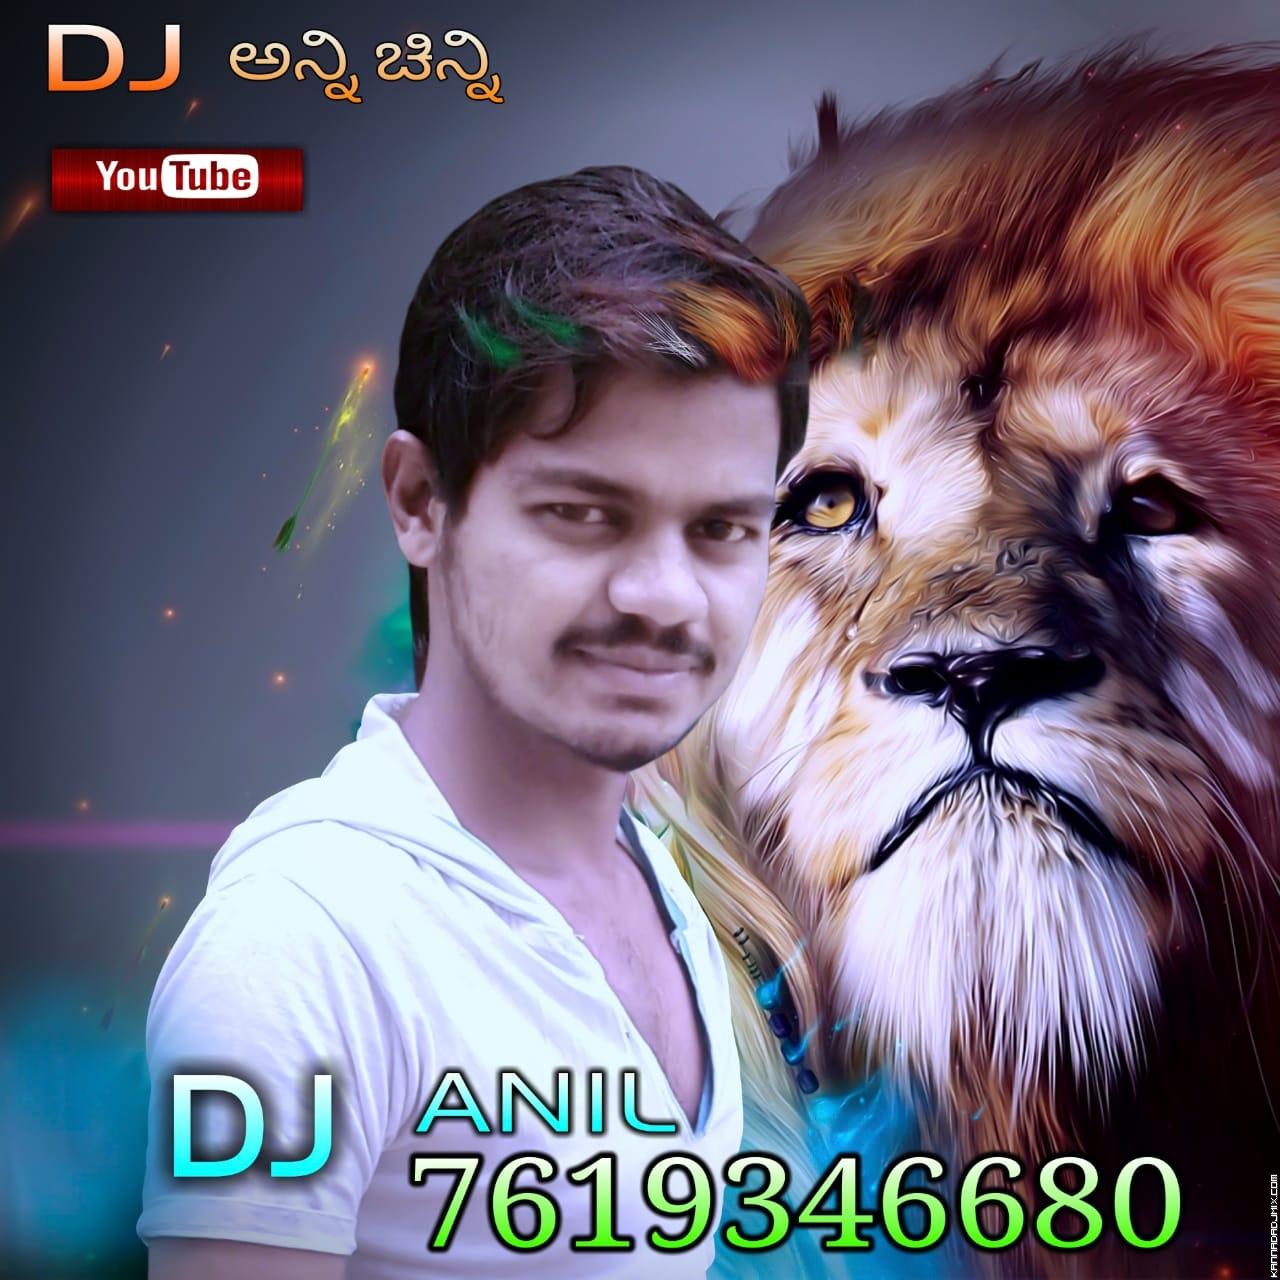 DEVA_SHREE_GANESHA_DJ_-_ANIL_VADDAR_BHAGAVATHI.mp3